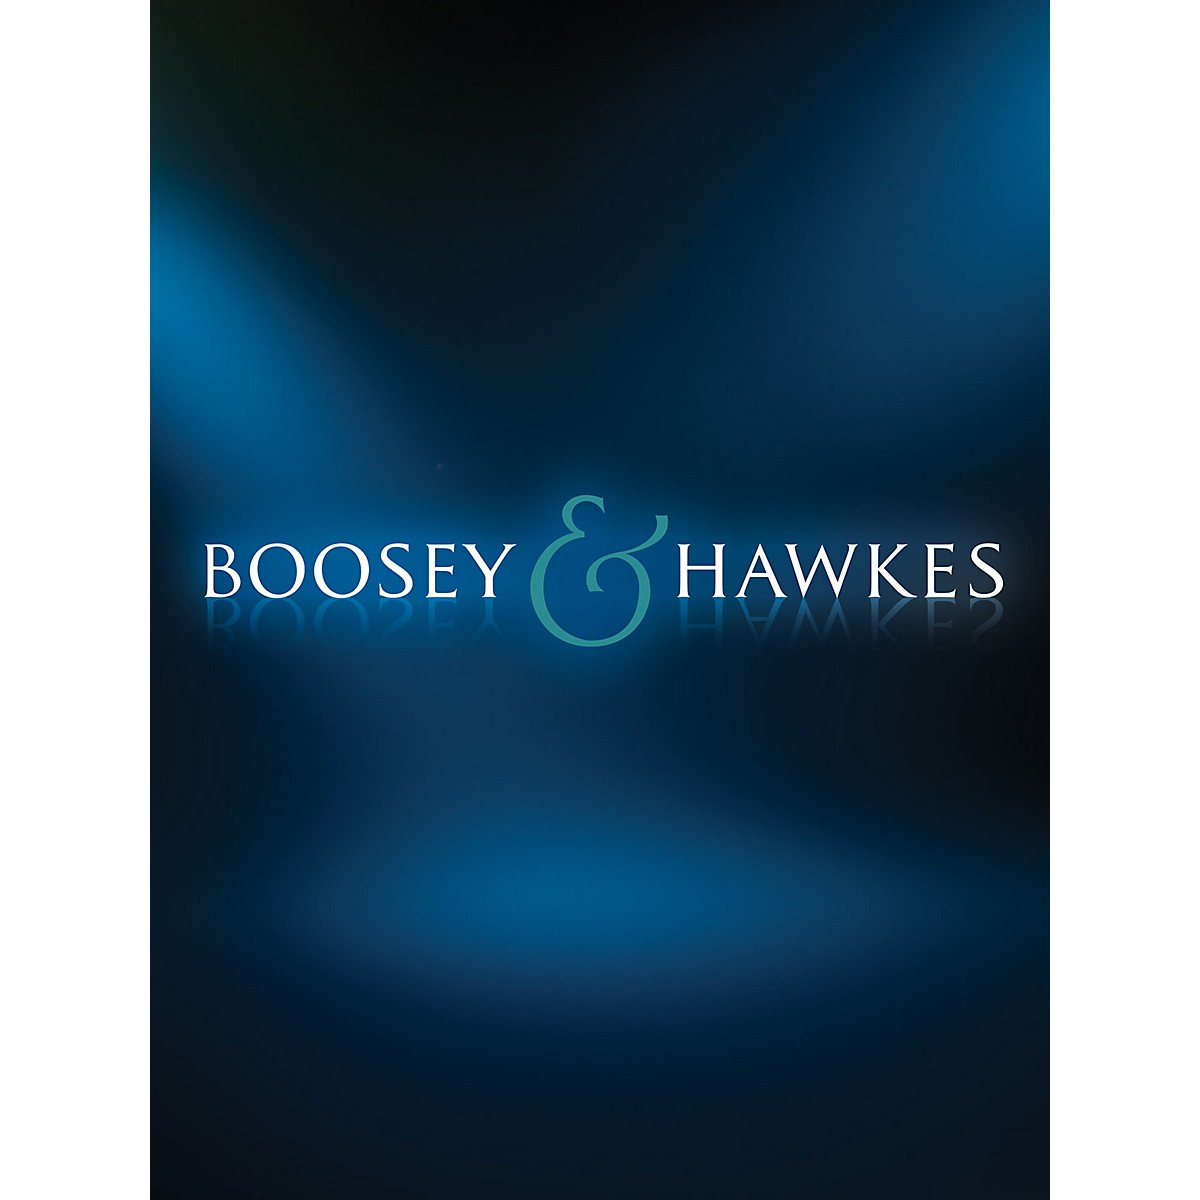 Boosey and Hawkes O Lux Trinitas (SATB divisi with Organ) SATB Divisi Composed by Randall Davidson